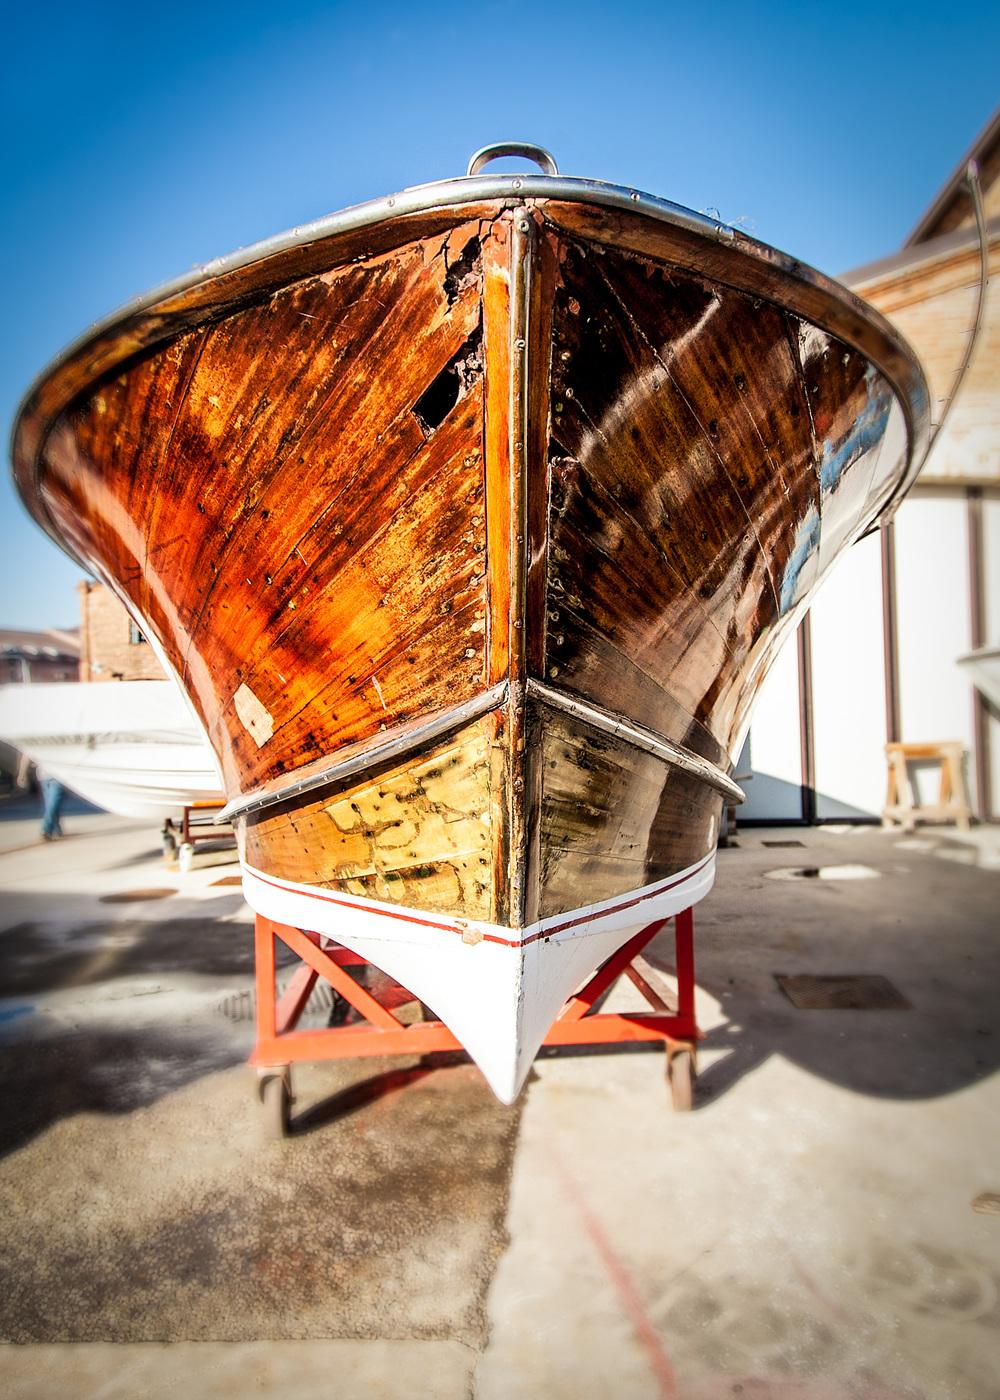 Boat repair yard in Giudecca Island across from Venice